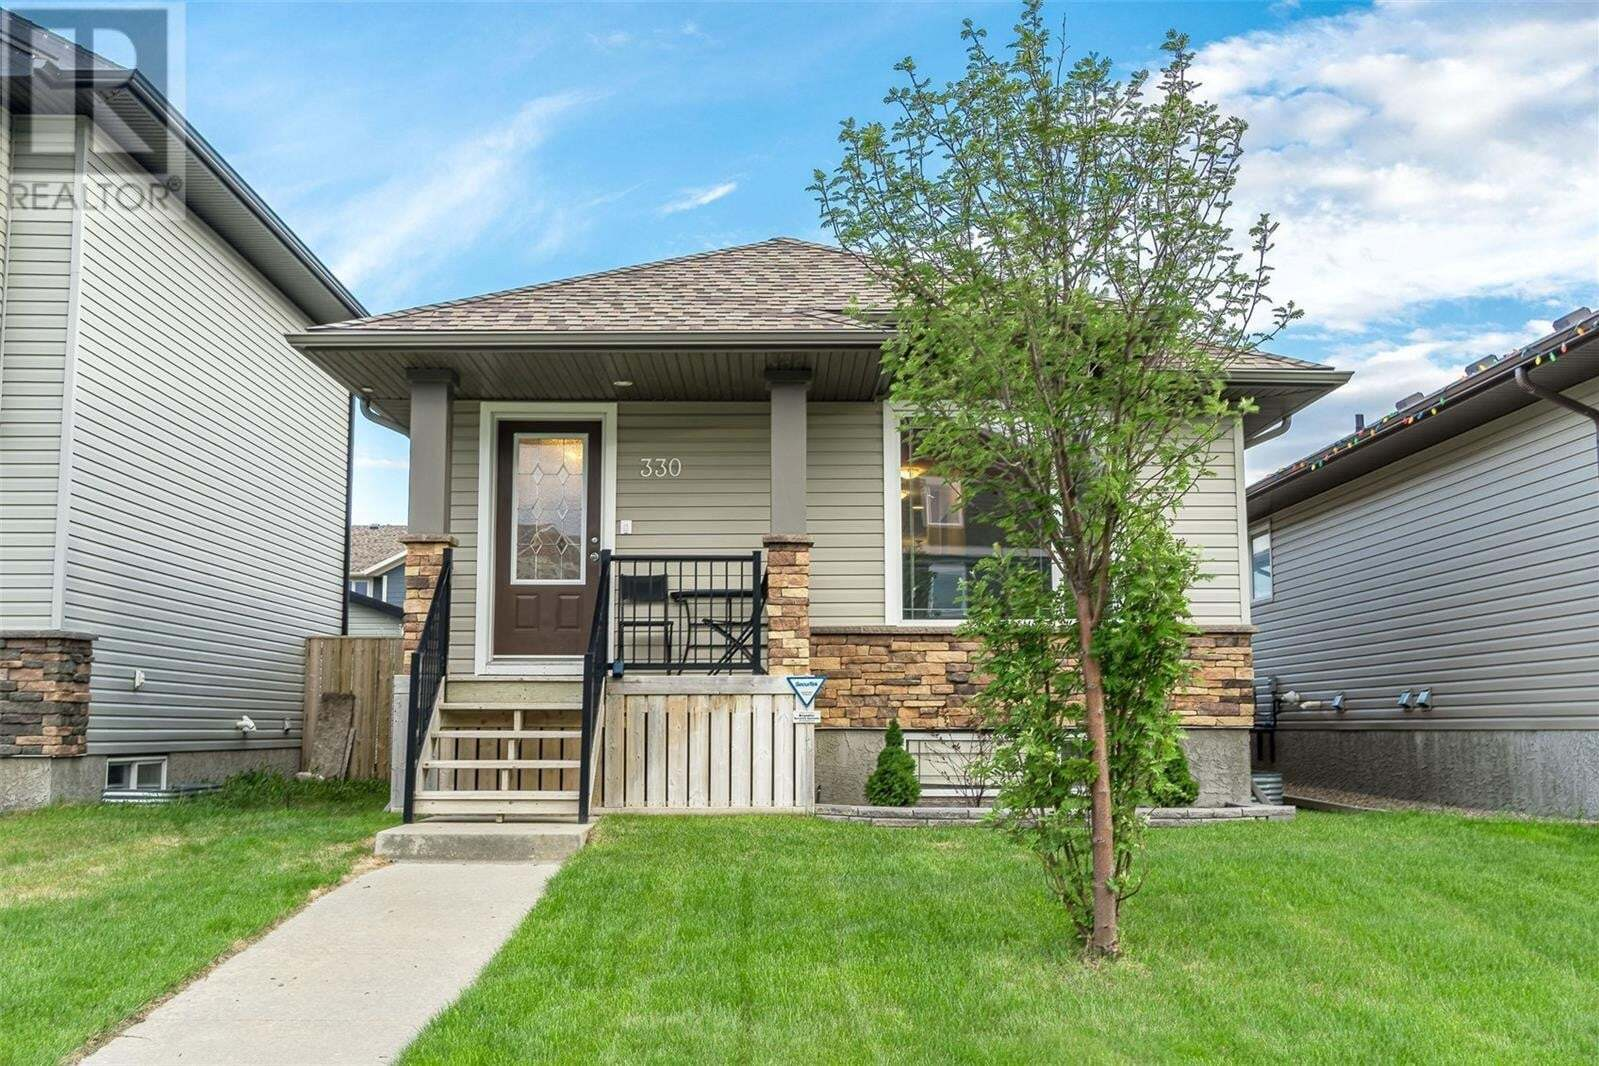 House for sale at 330 Cornish Rd Saskatoon Saskatchewan - MLS: SK809991